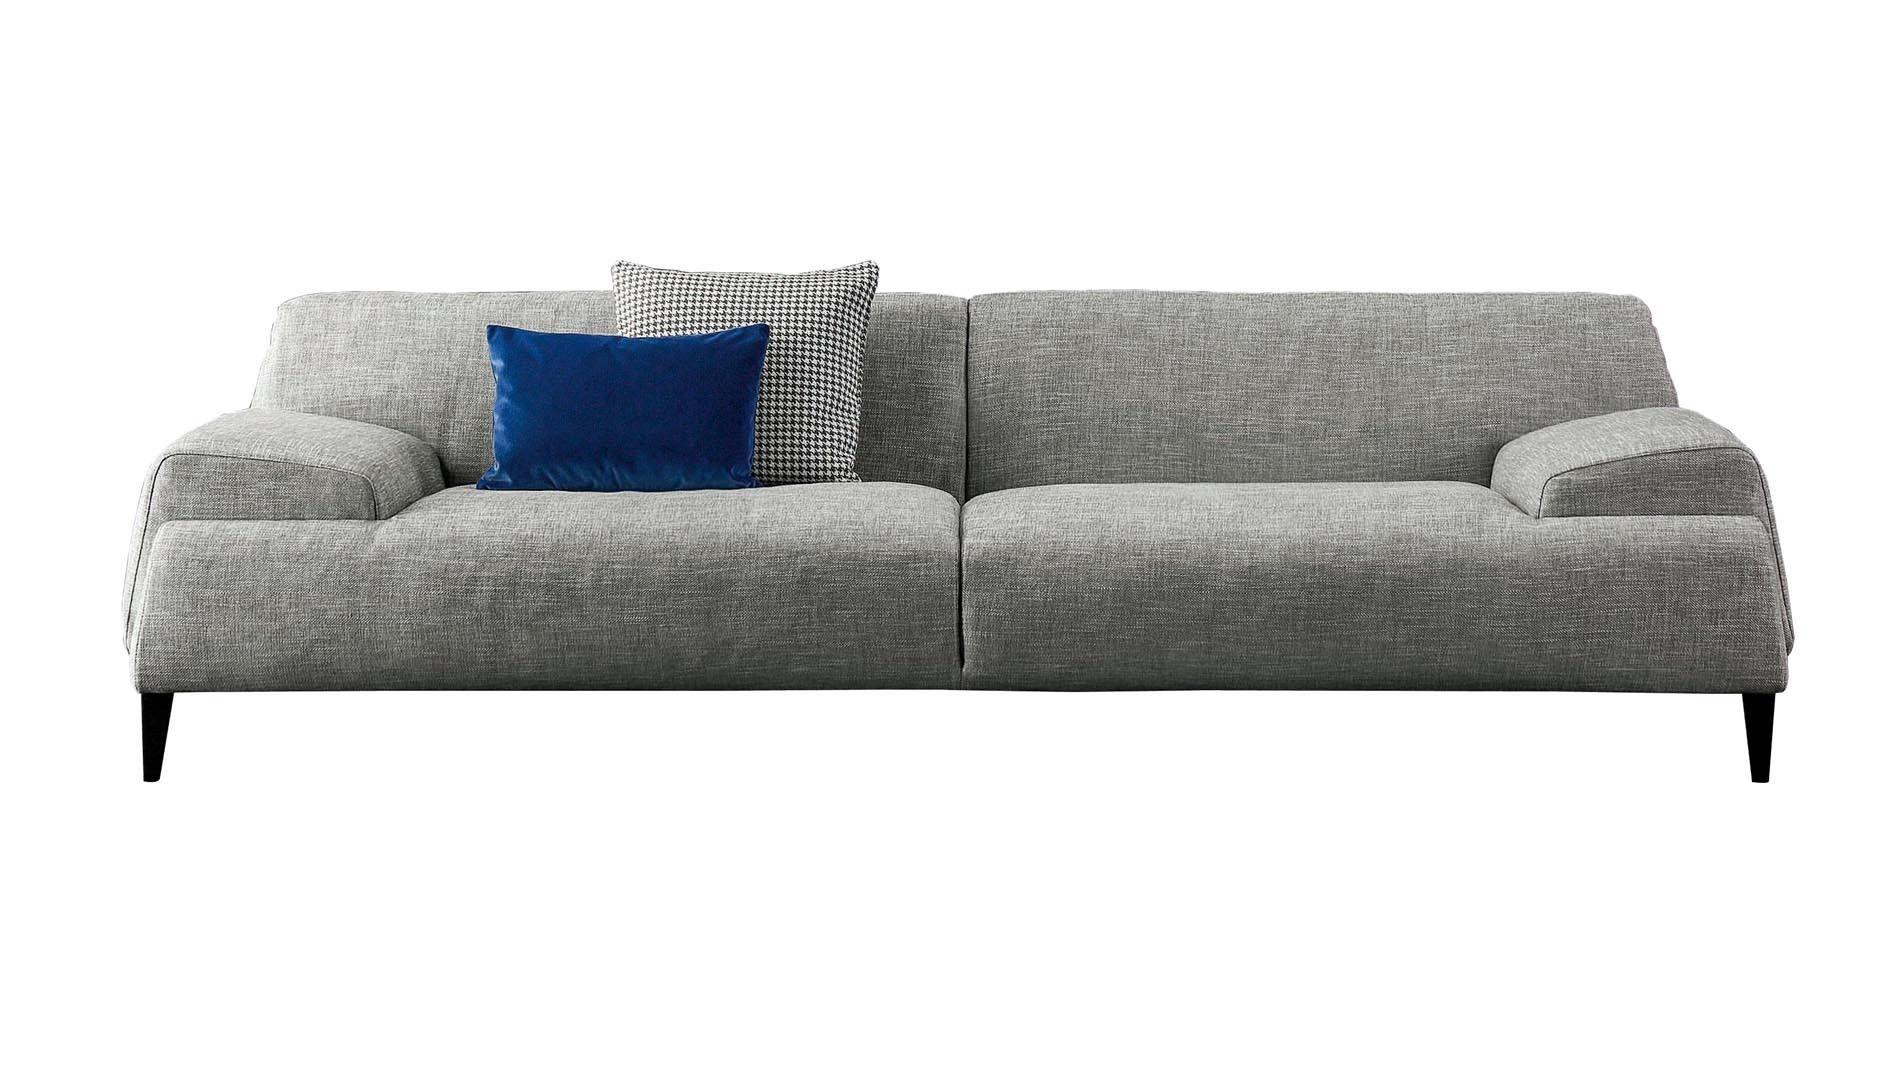 Bonaldo Cave Sofa Buy line at LuxDeco Lounge